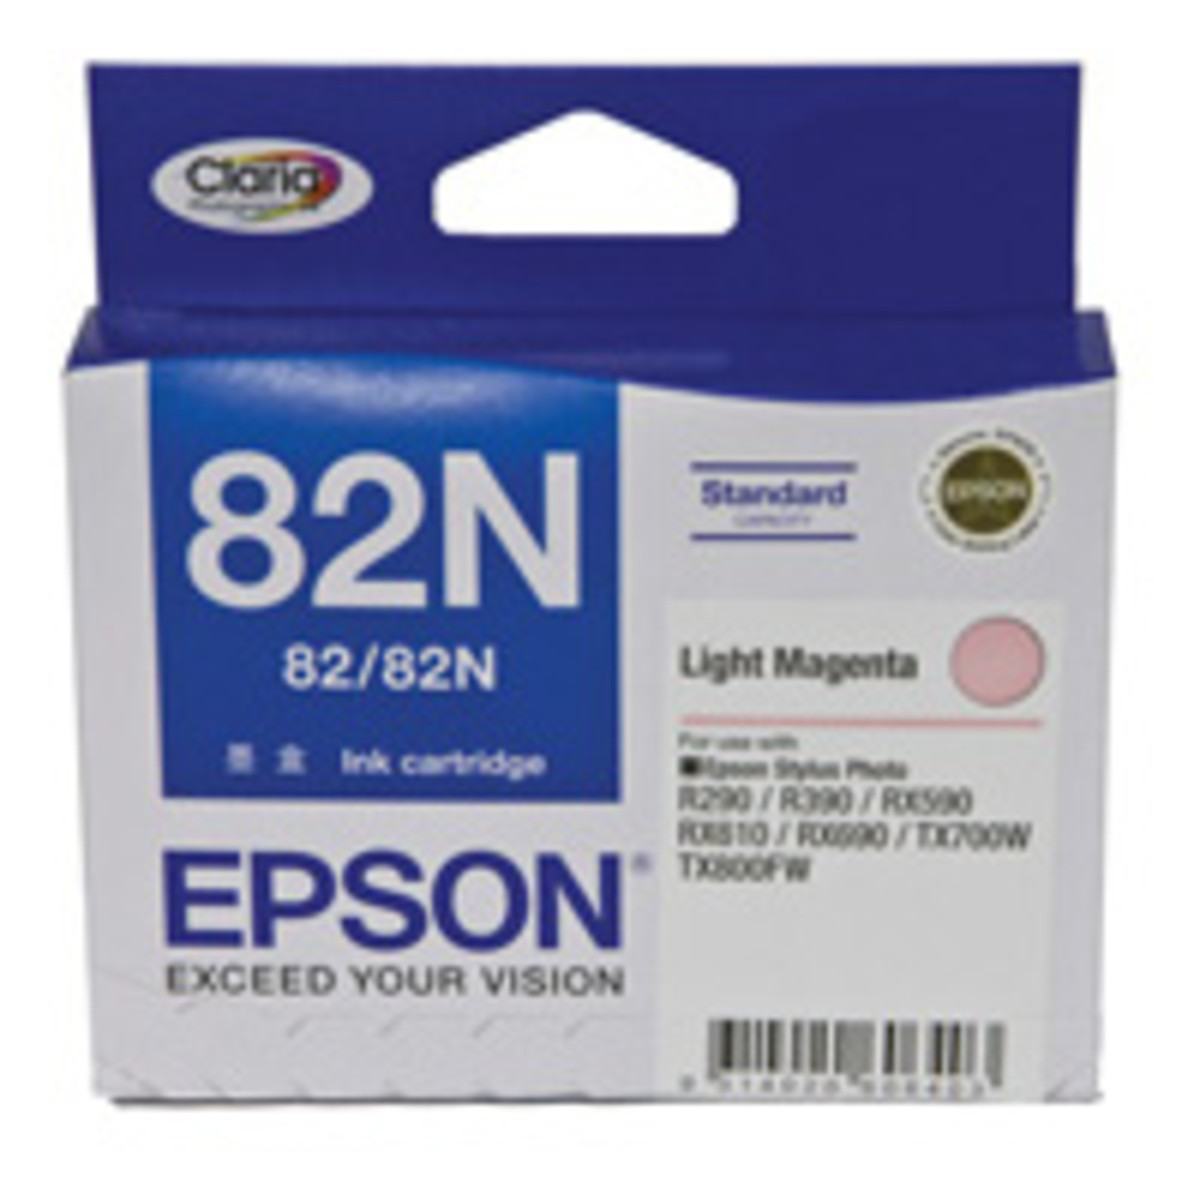 Epson 82N Light Magenta Ink Cartridge